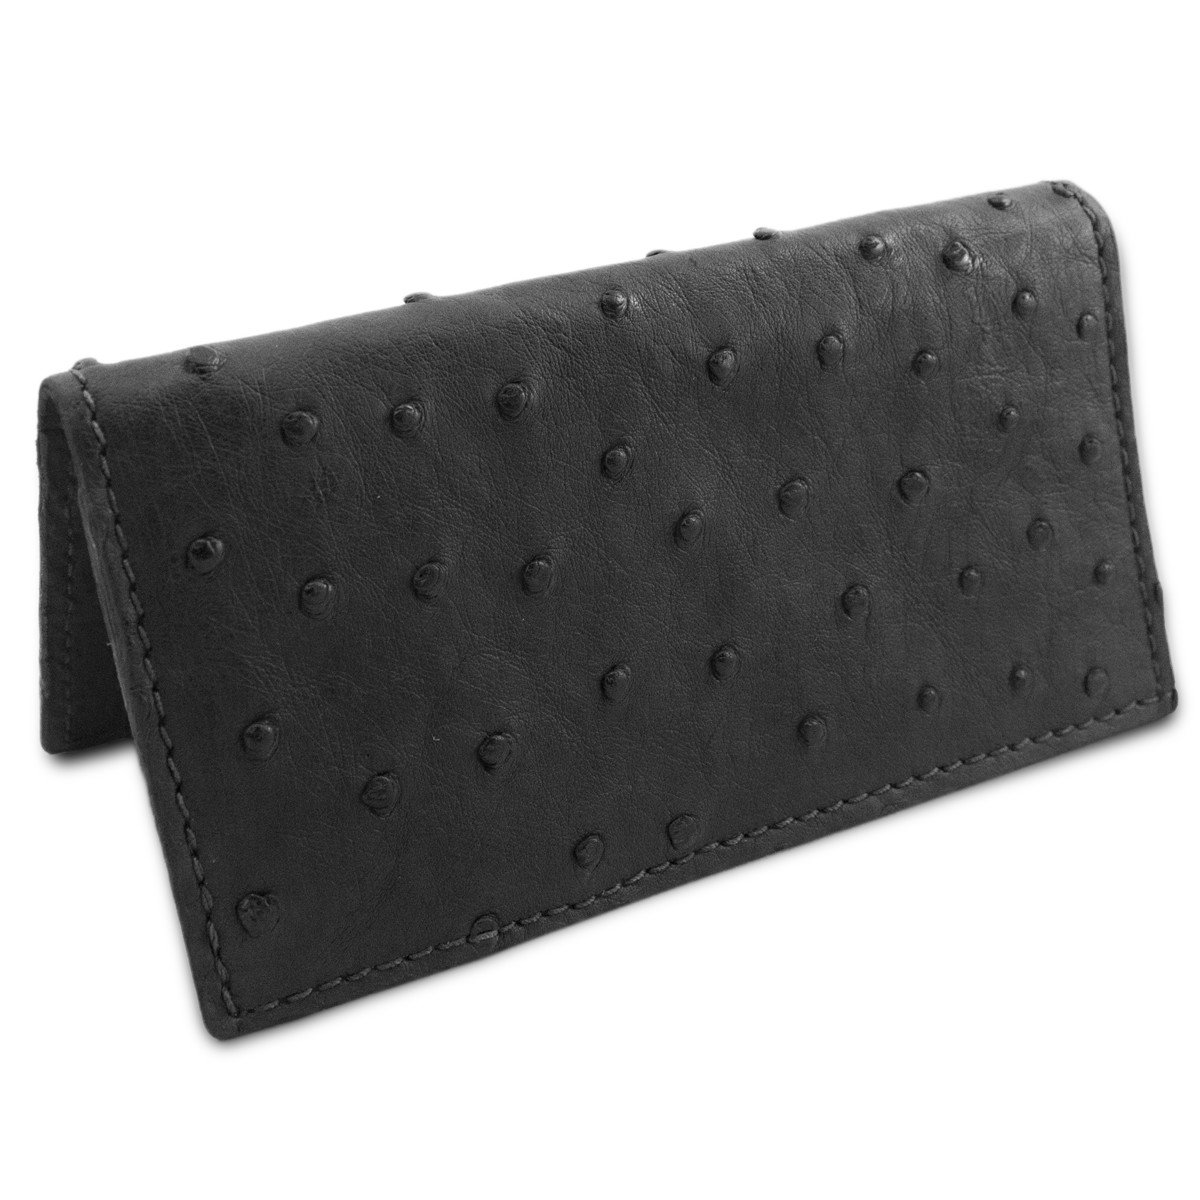 Black Genuine Ostrich Skin Leather Checkbook Cover USA Handmade